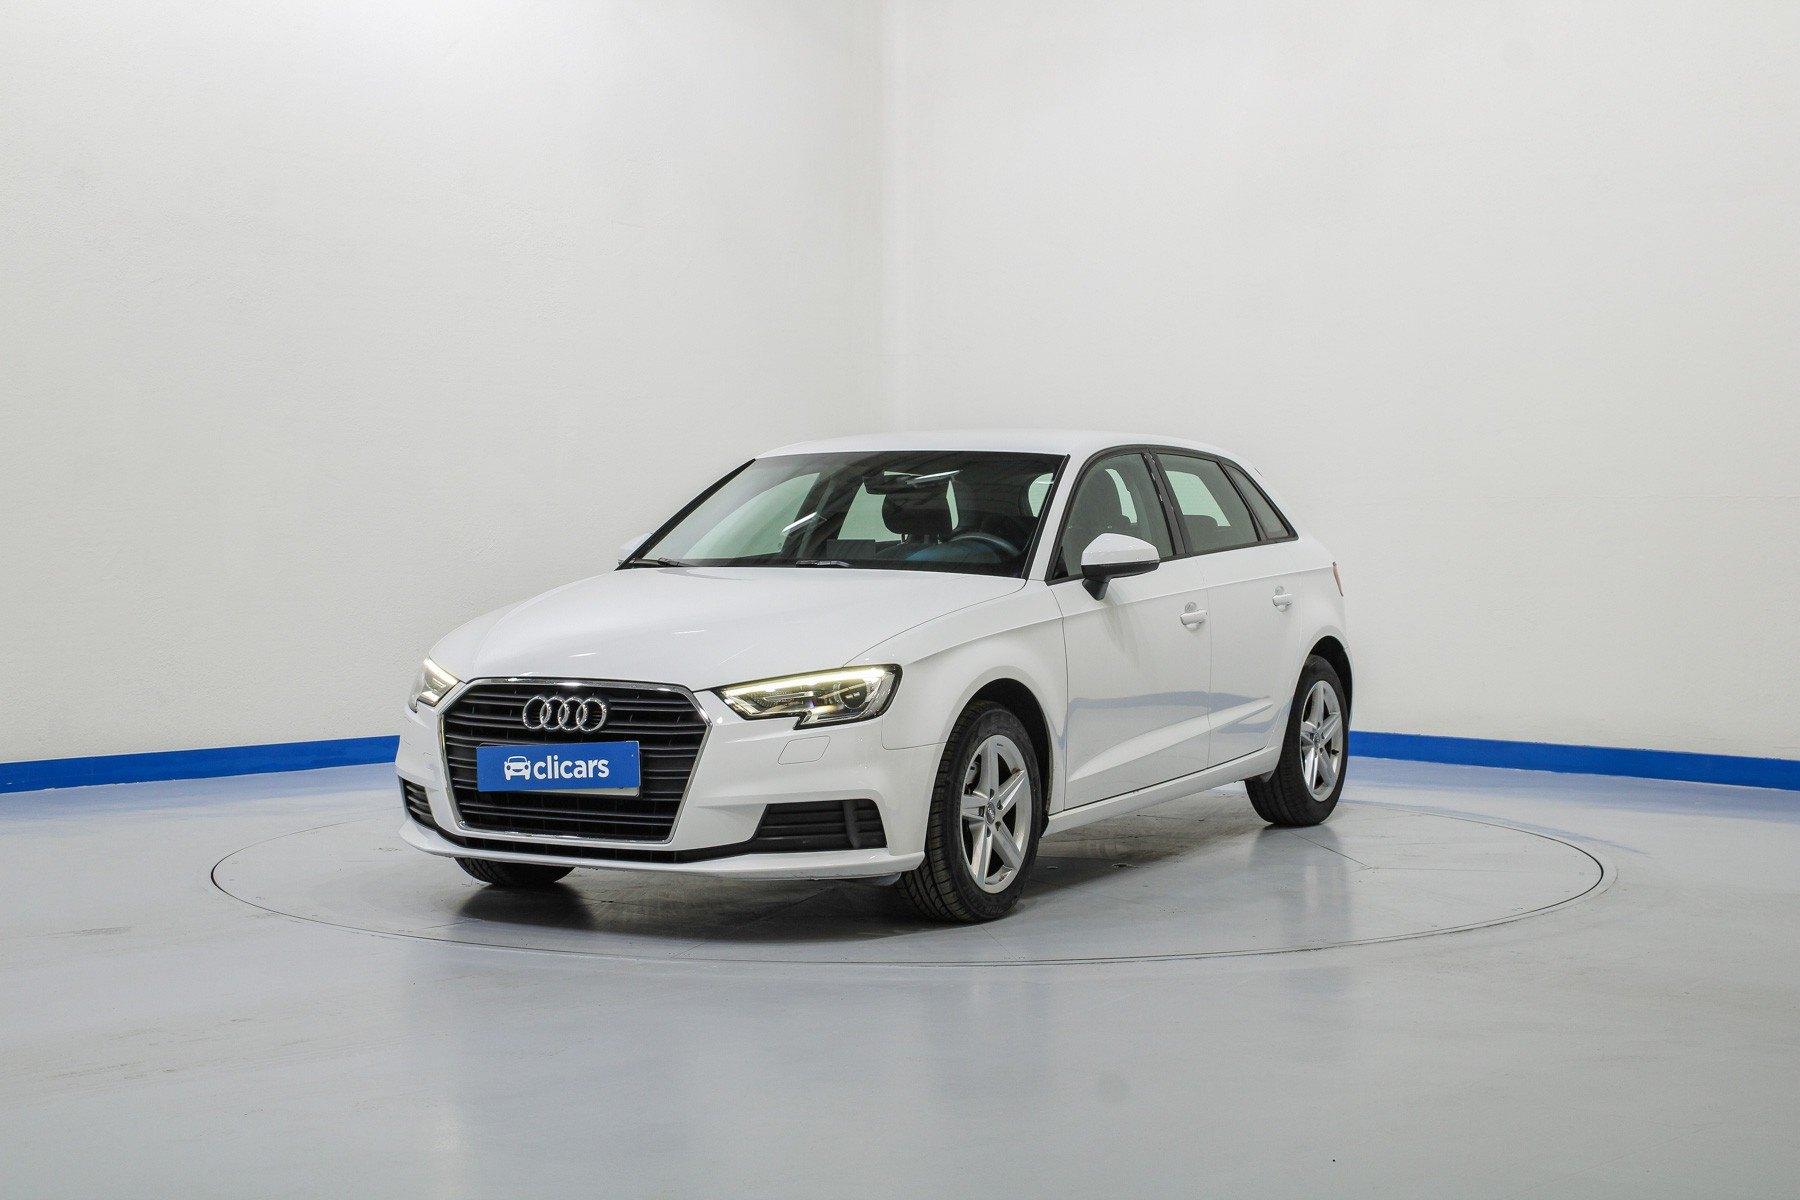 Audi A3 Diésel 1.6 TDI 85kW (116CV) Sportback 1